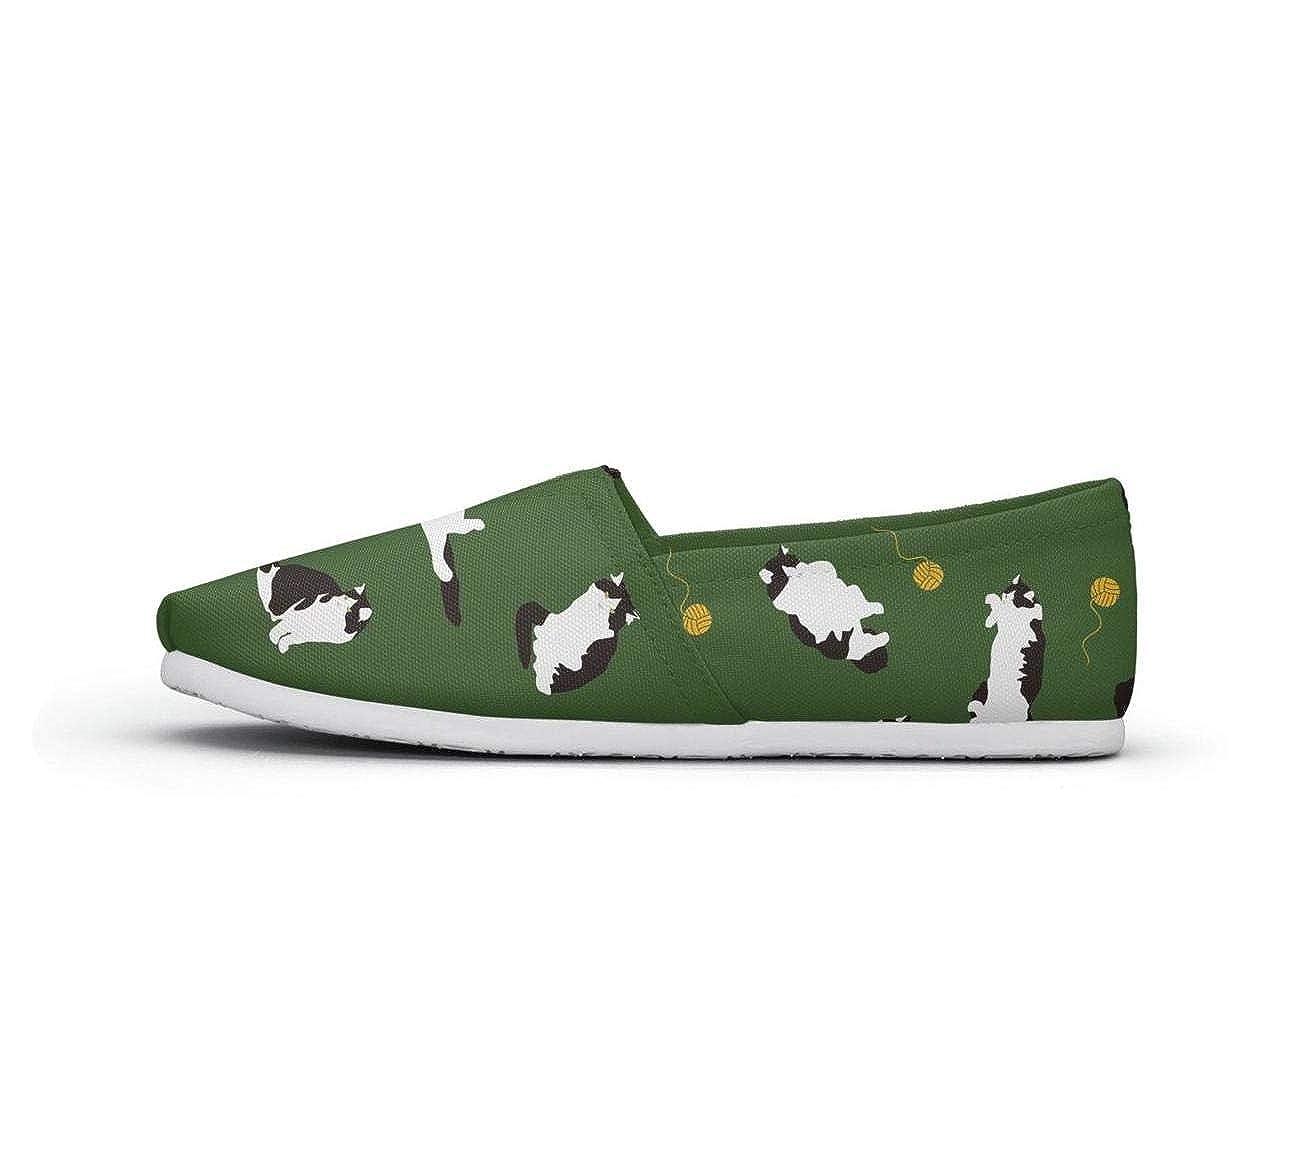 nkfbx Black cat Casual Slip-On Canva Shoes for Girls Walking